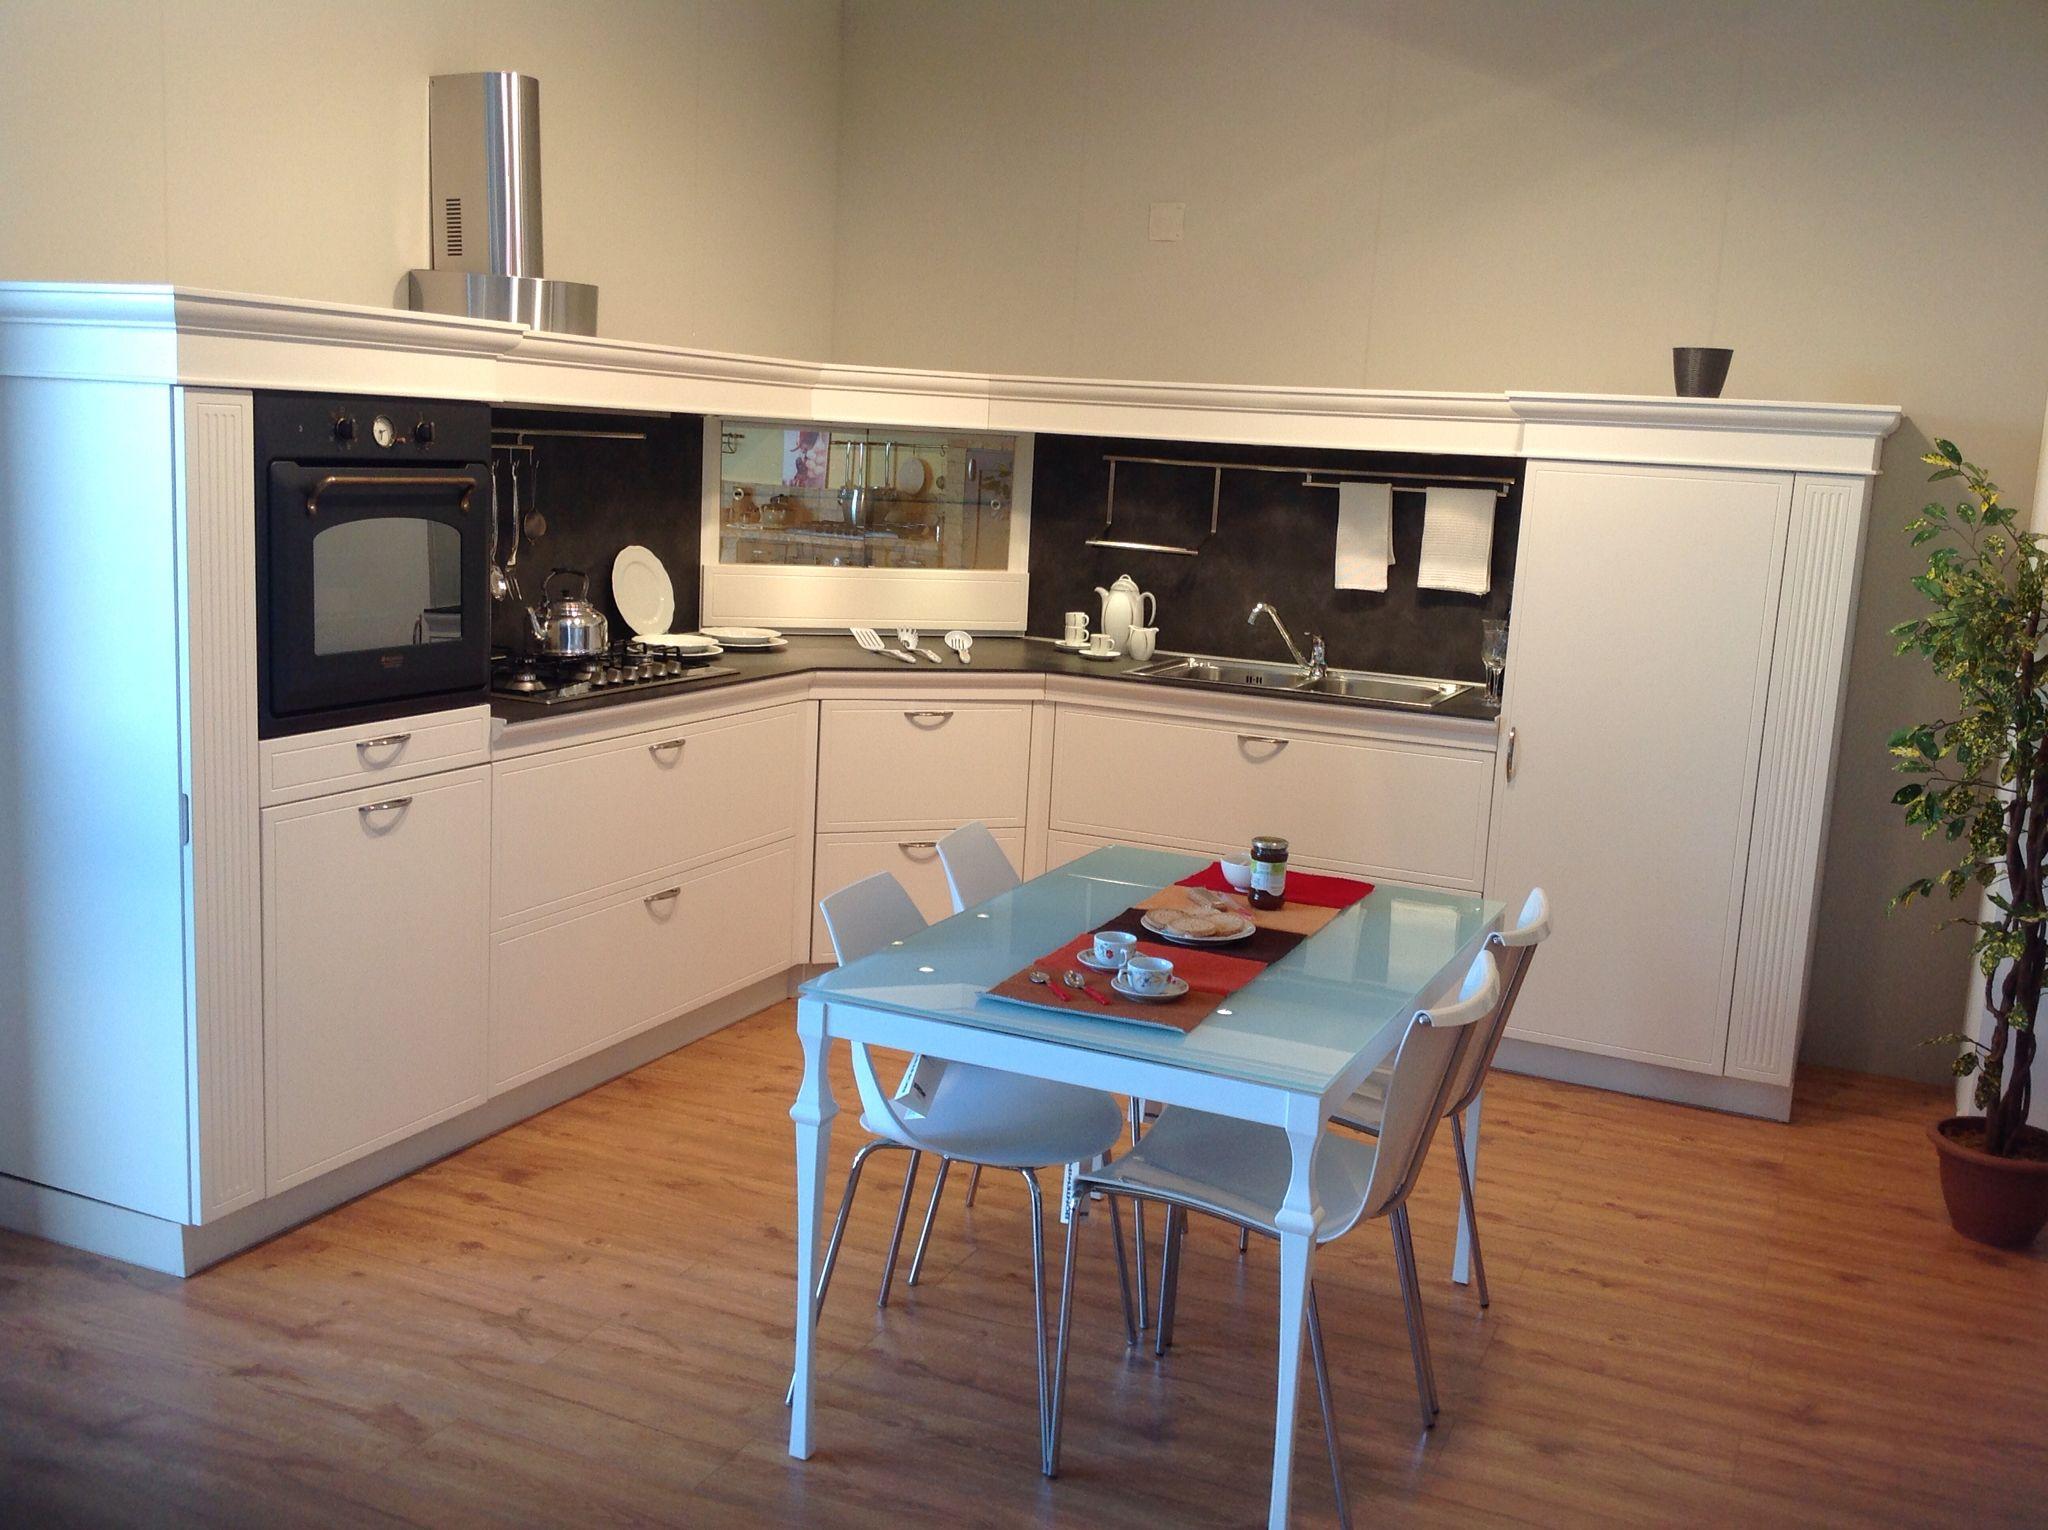 Cucina Snaidero Florence | Arredamento Low Cost | Pinterest | Cucina